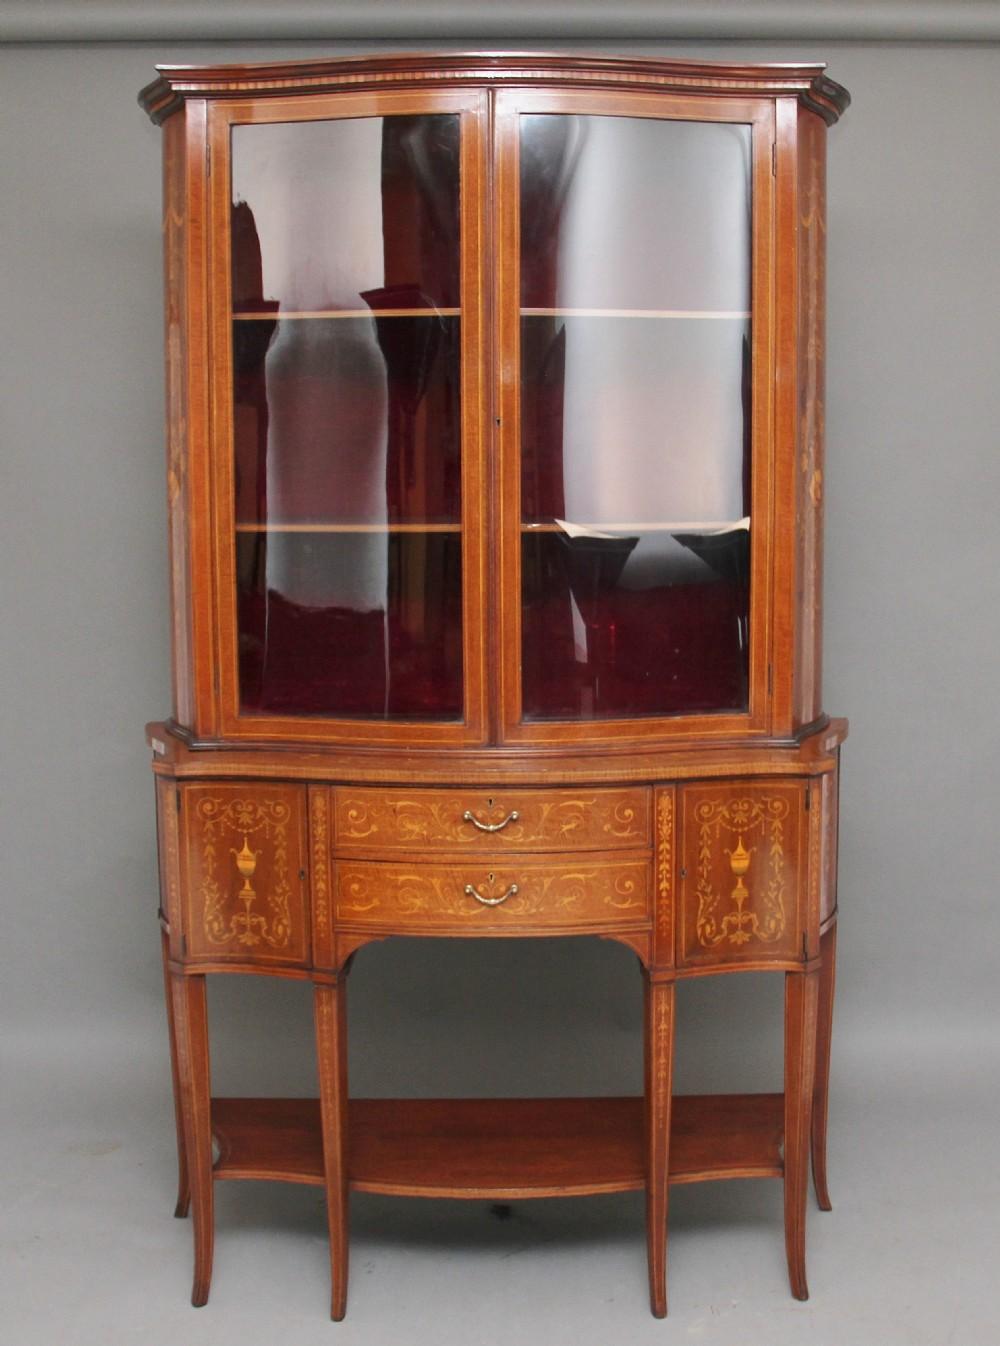 19th century inlaid mahogany display cabinet